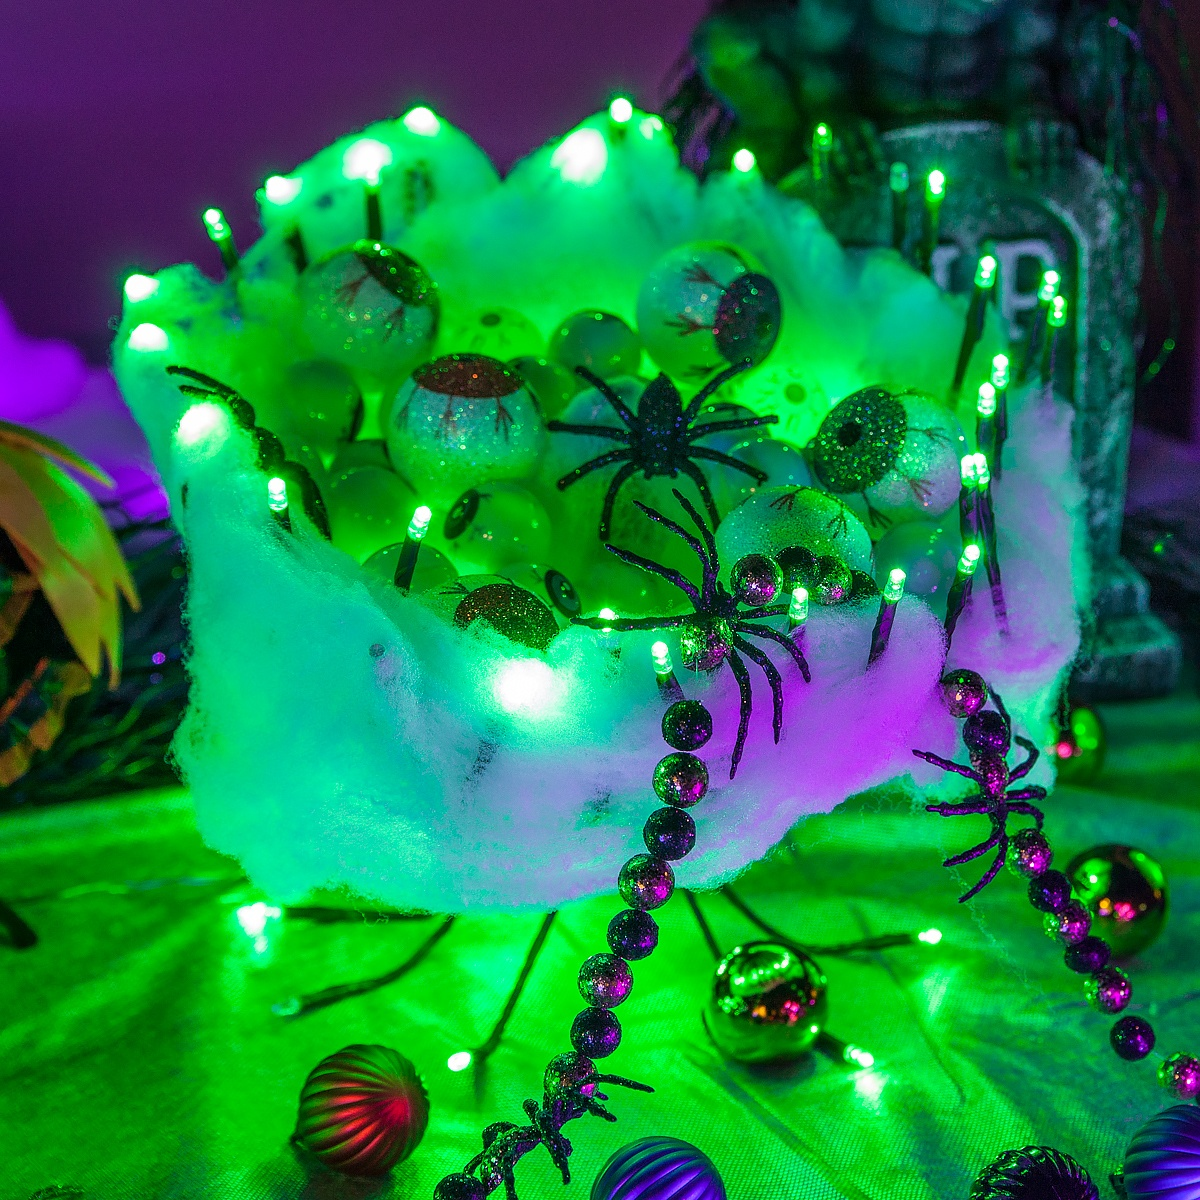 DIY Halloween Decoration - Creepy eyeball bowl made using starbust lighted branches